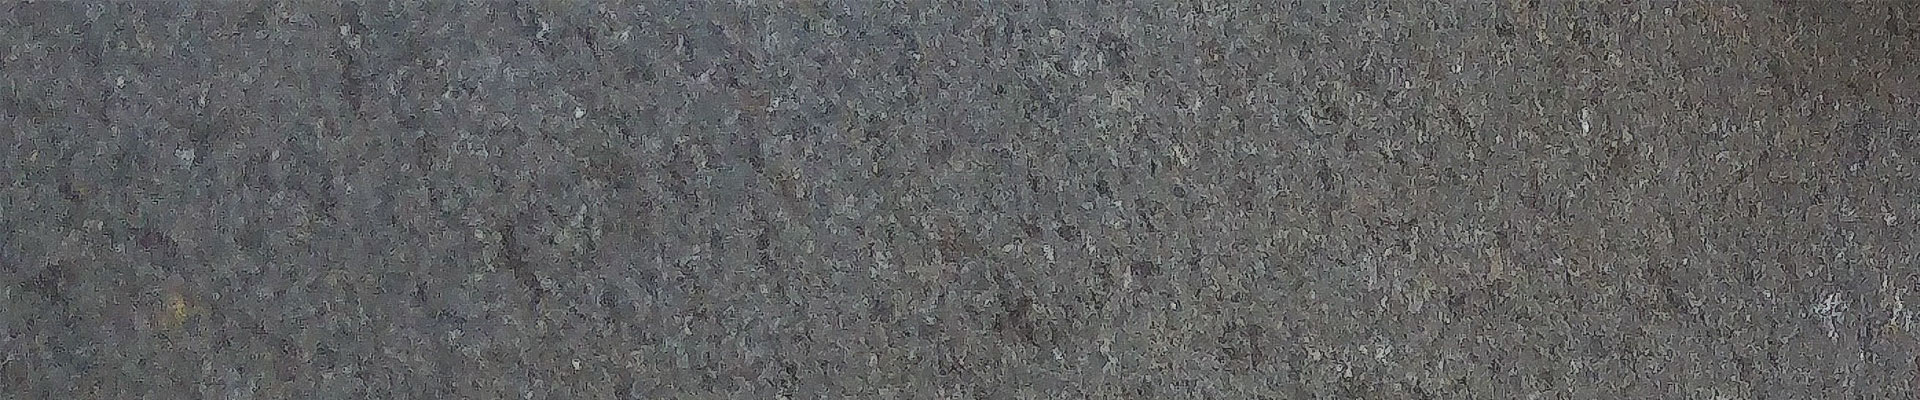 Abbildung Oberfläche Granit-Arbeitsplatte